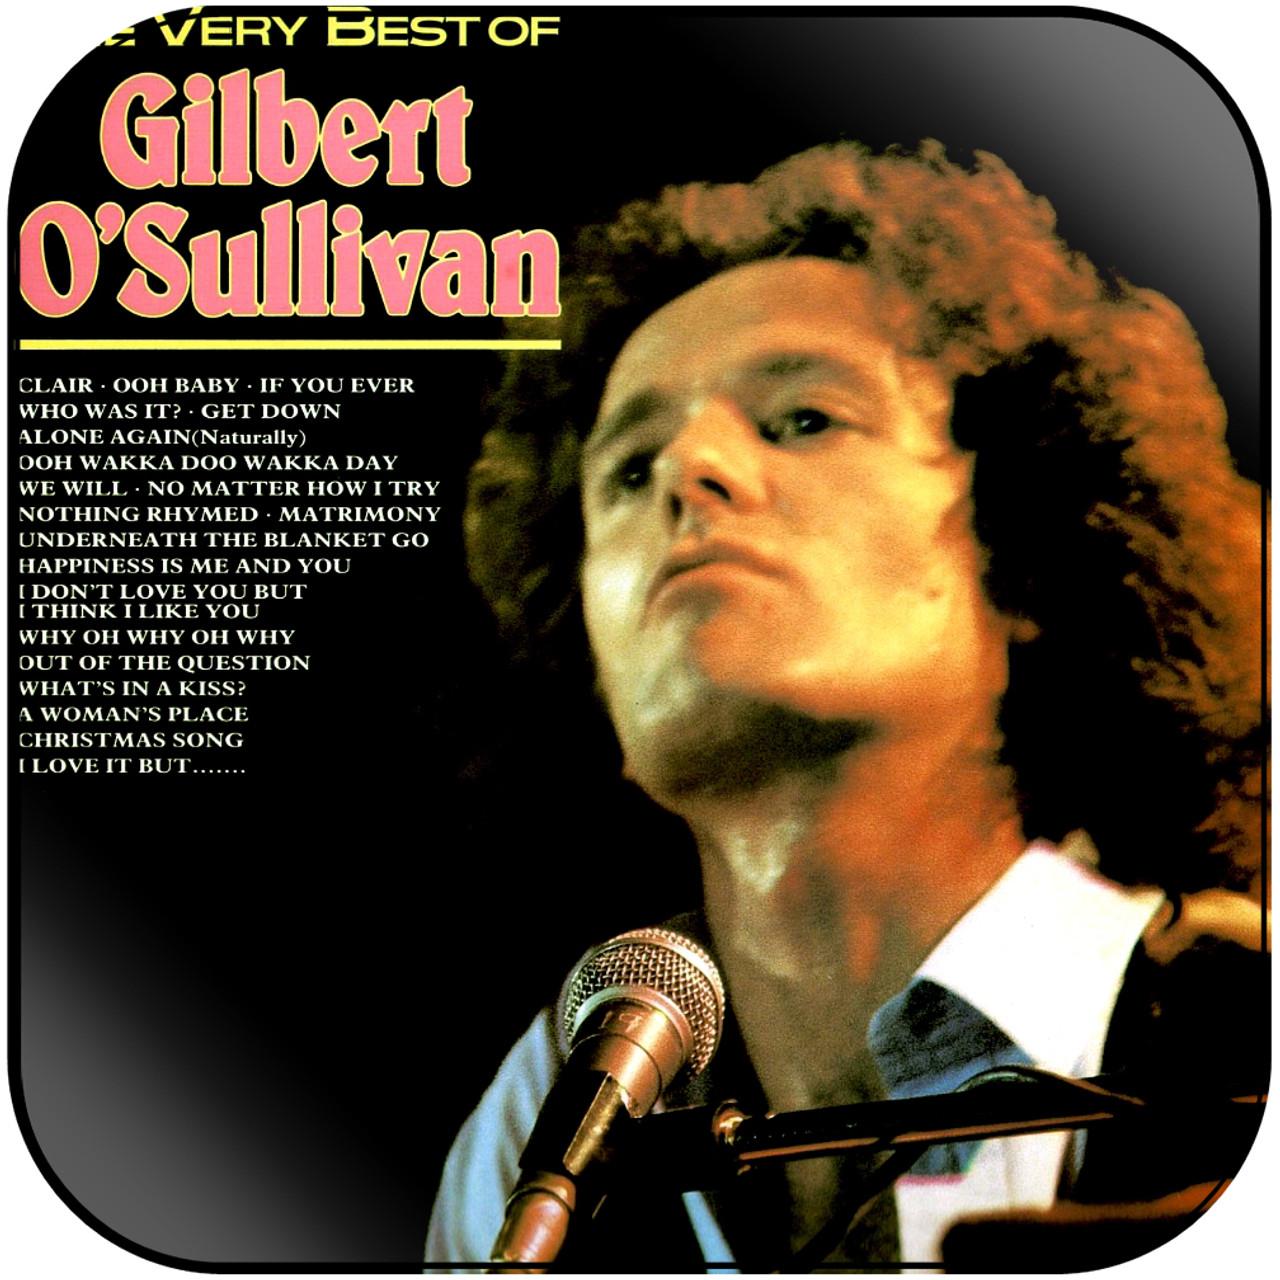 The Best of Gilbert OSullivan